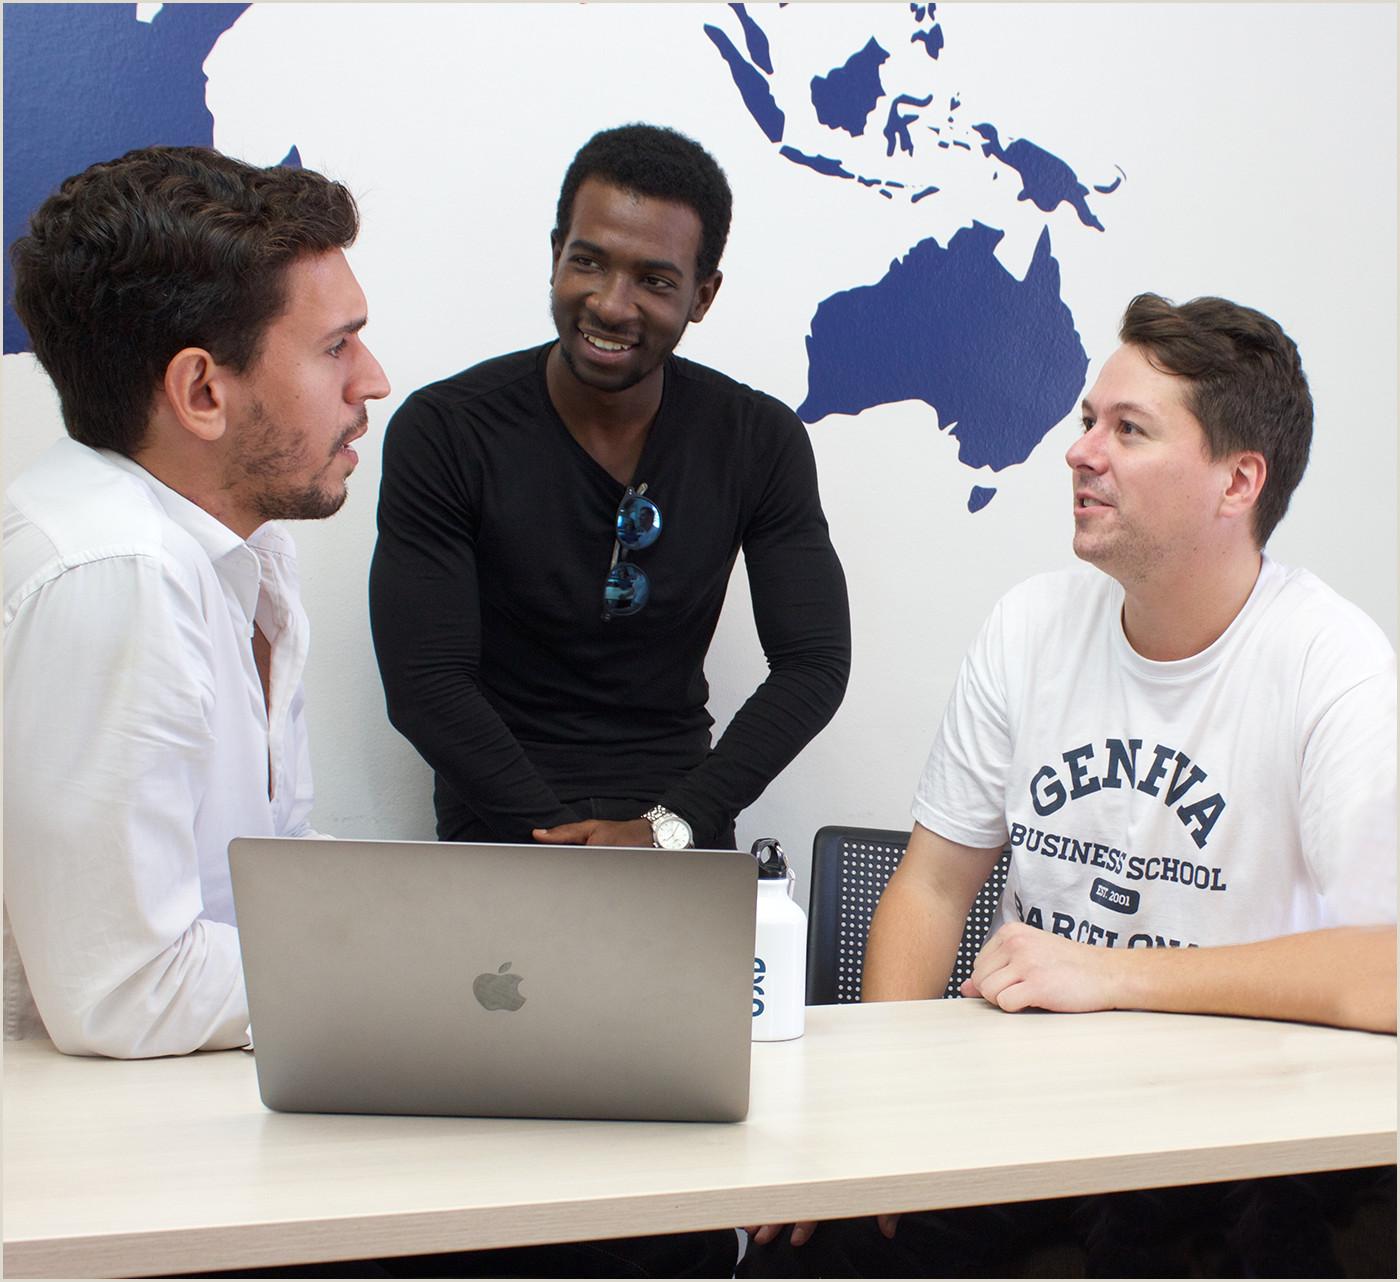 Creative Business Geneva Business School